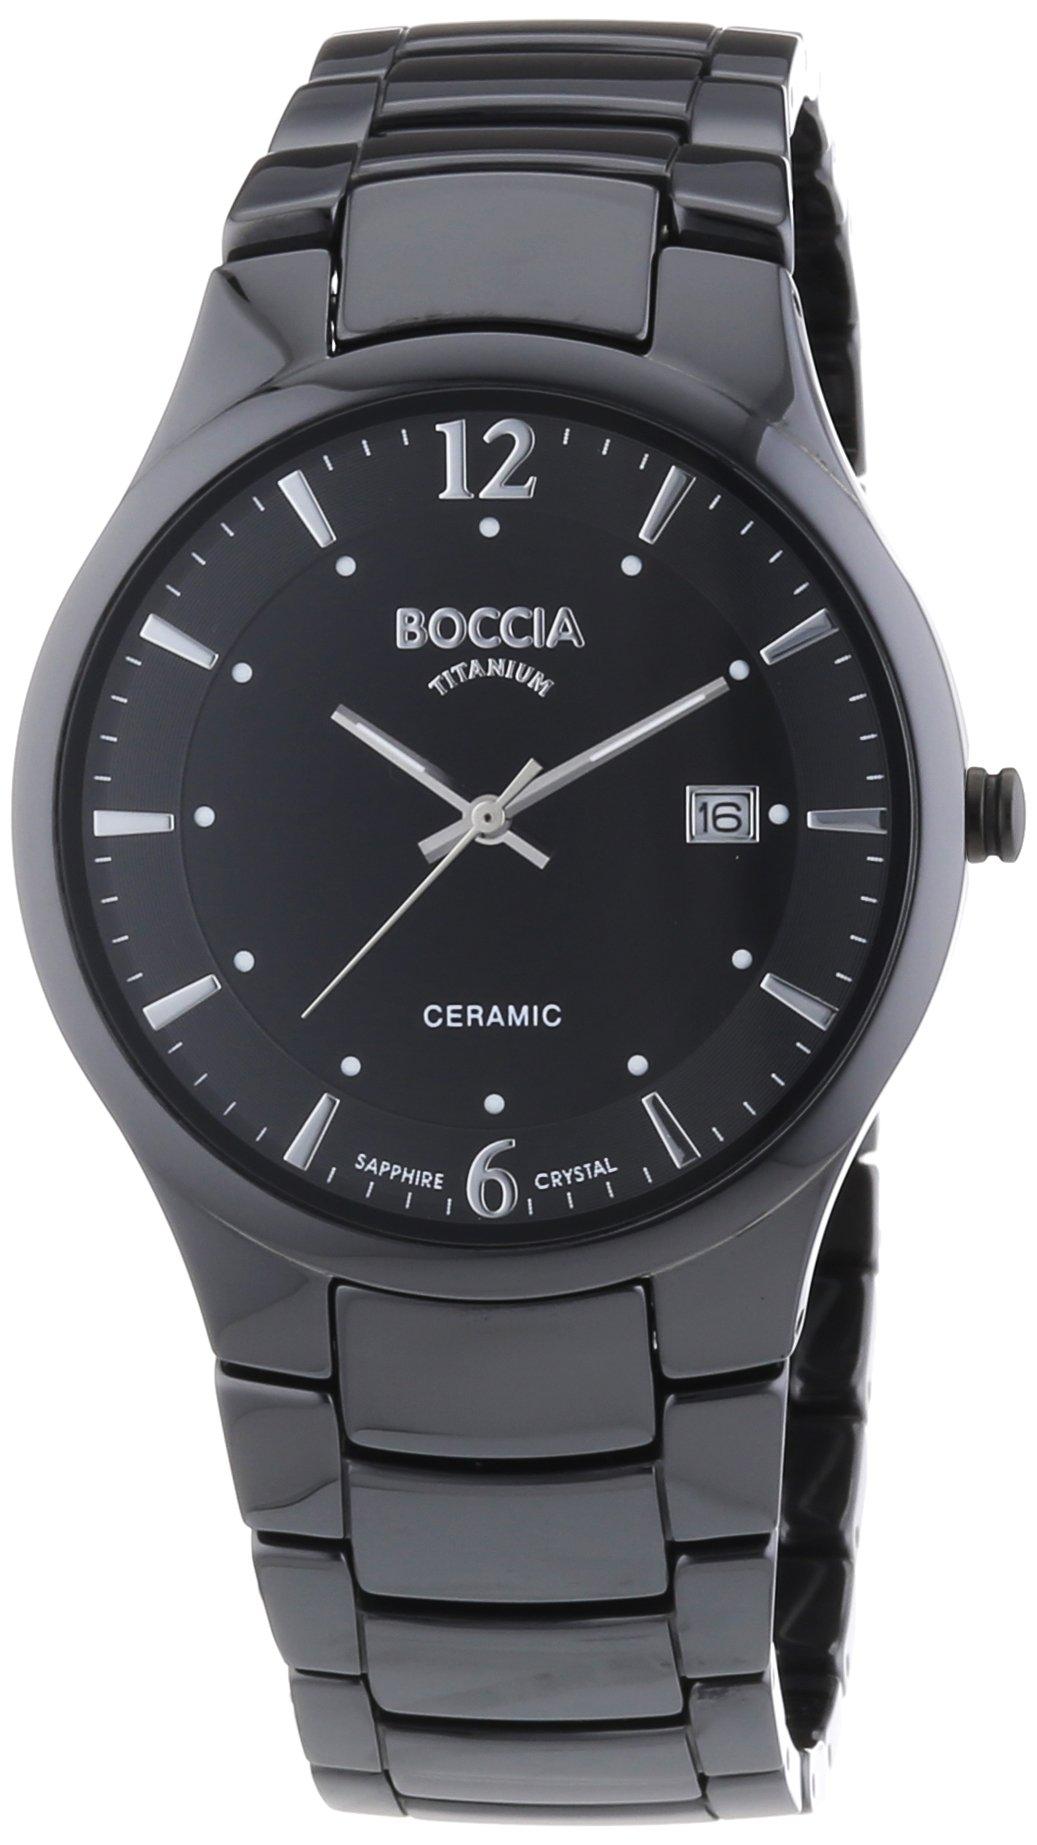 Boccia Herrenuhr Analog Quarz mit Keramikarmband – 3572-02